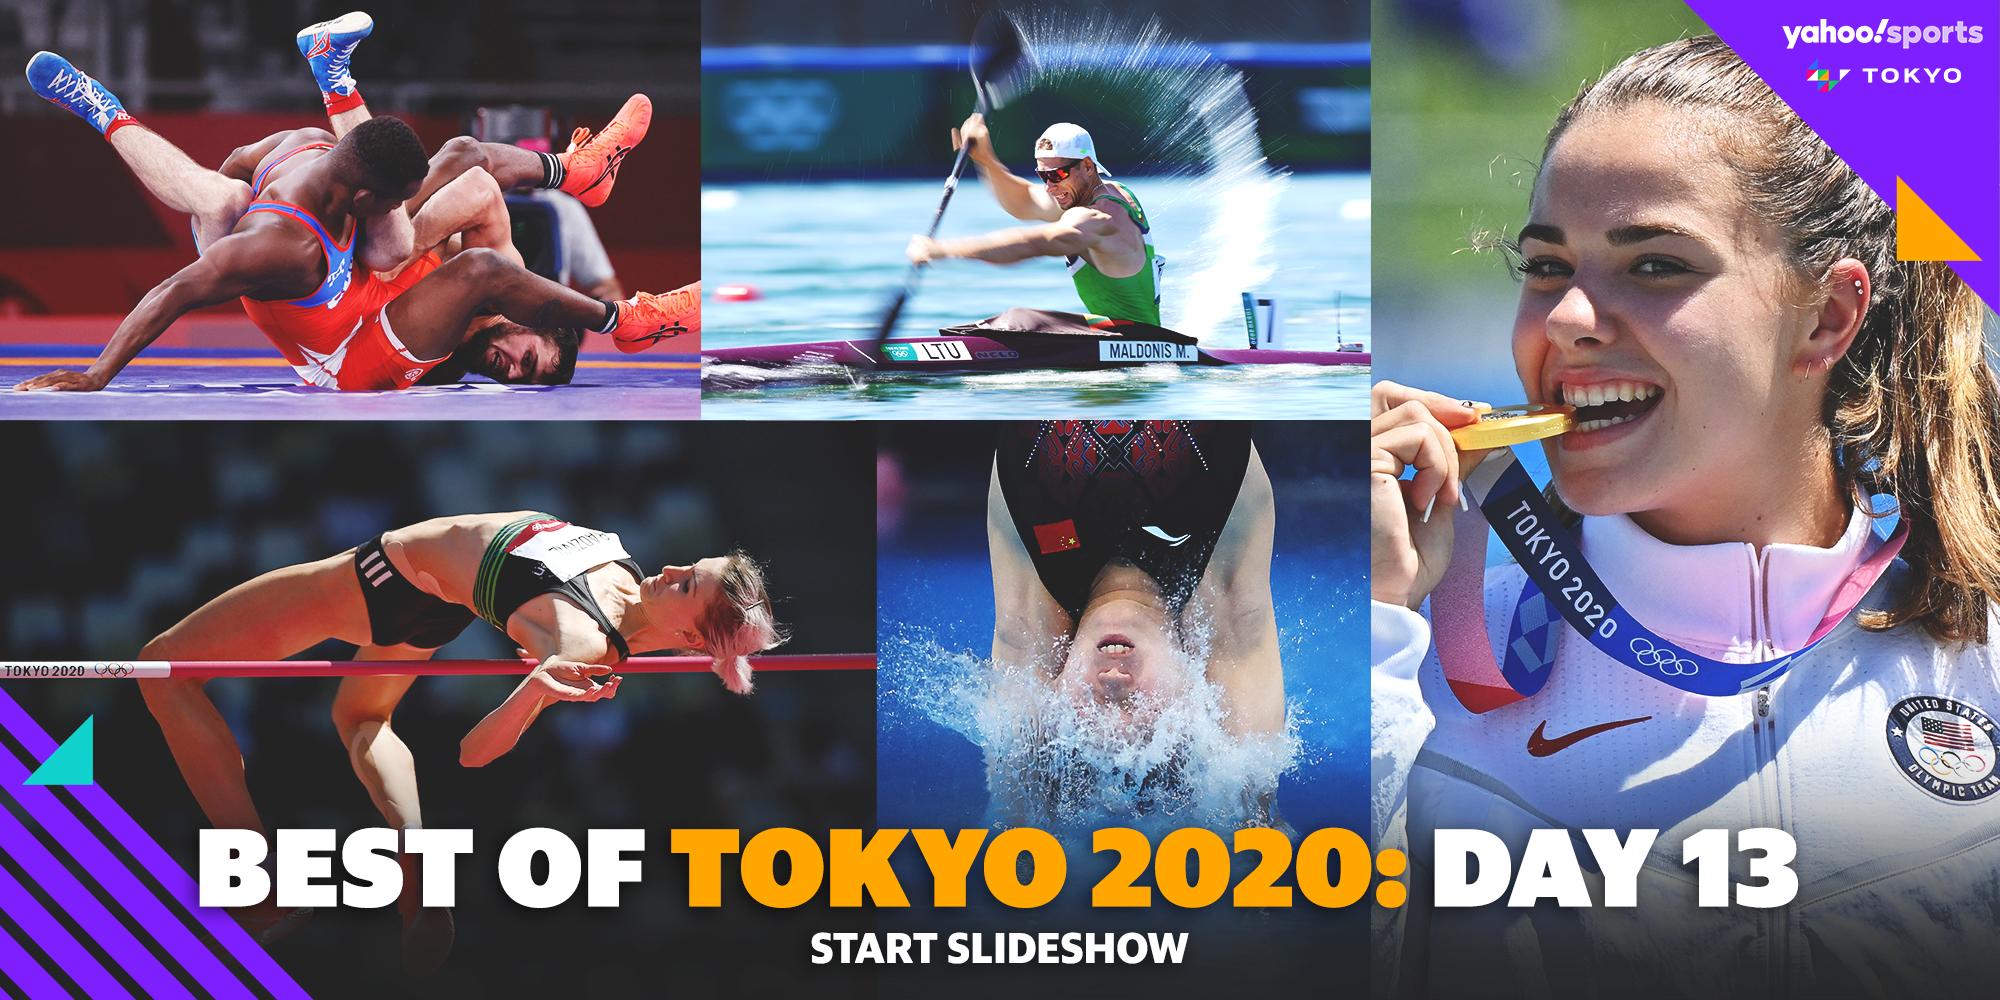 Best of Tokyo 2020 Day 13 slideshow embed